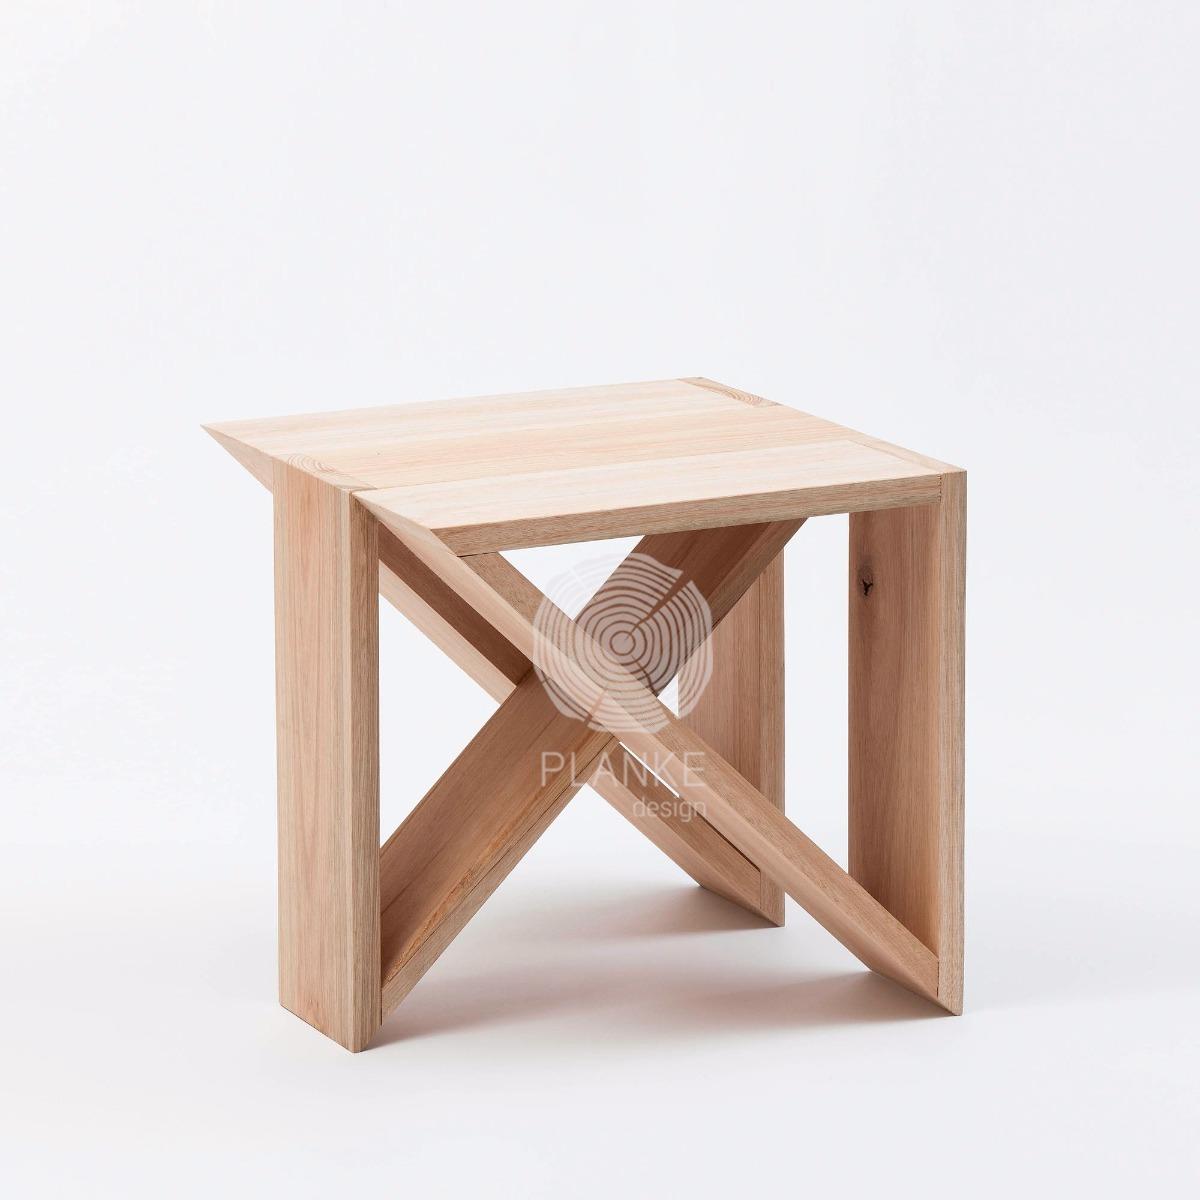 Mesa / Banco Modular - Madera Maciza - Muebles De Diseño - $ 4.900 ...